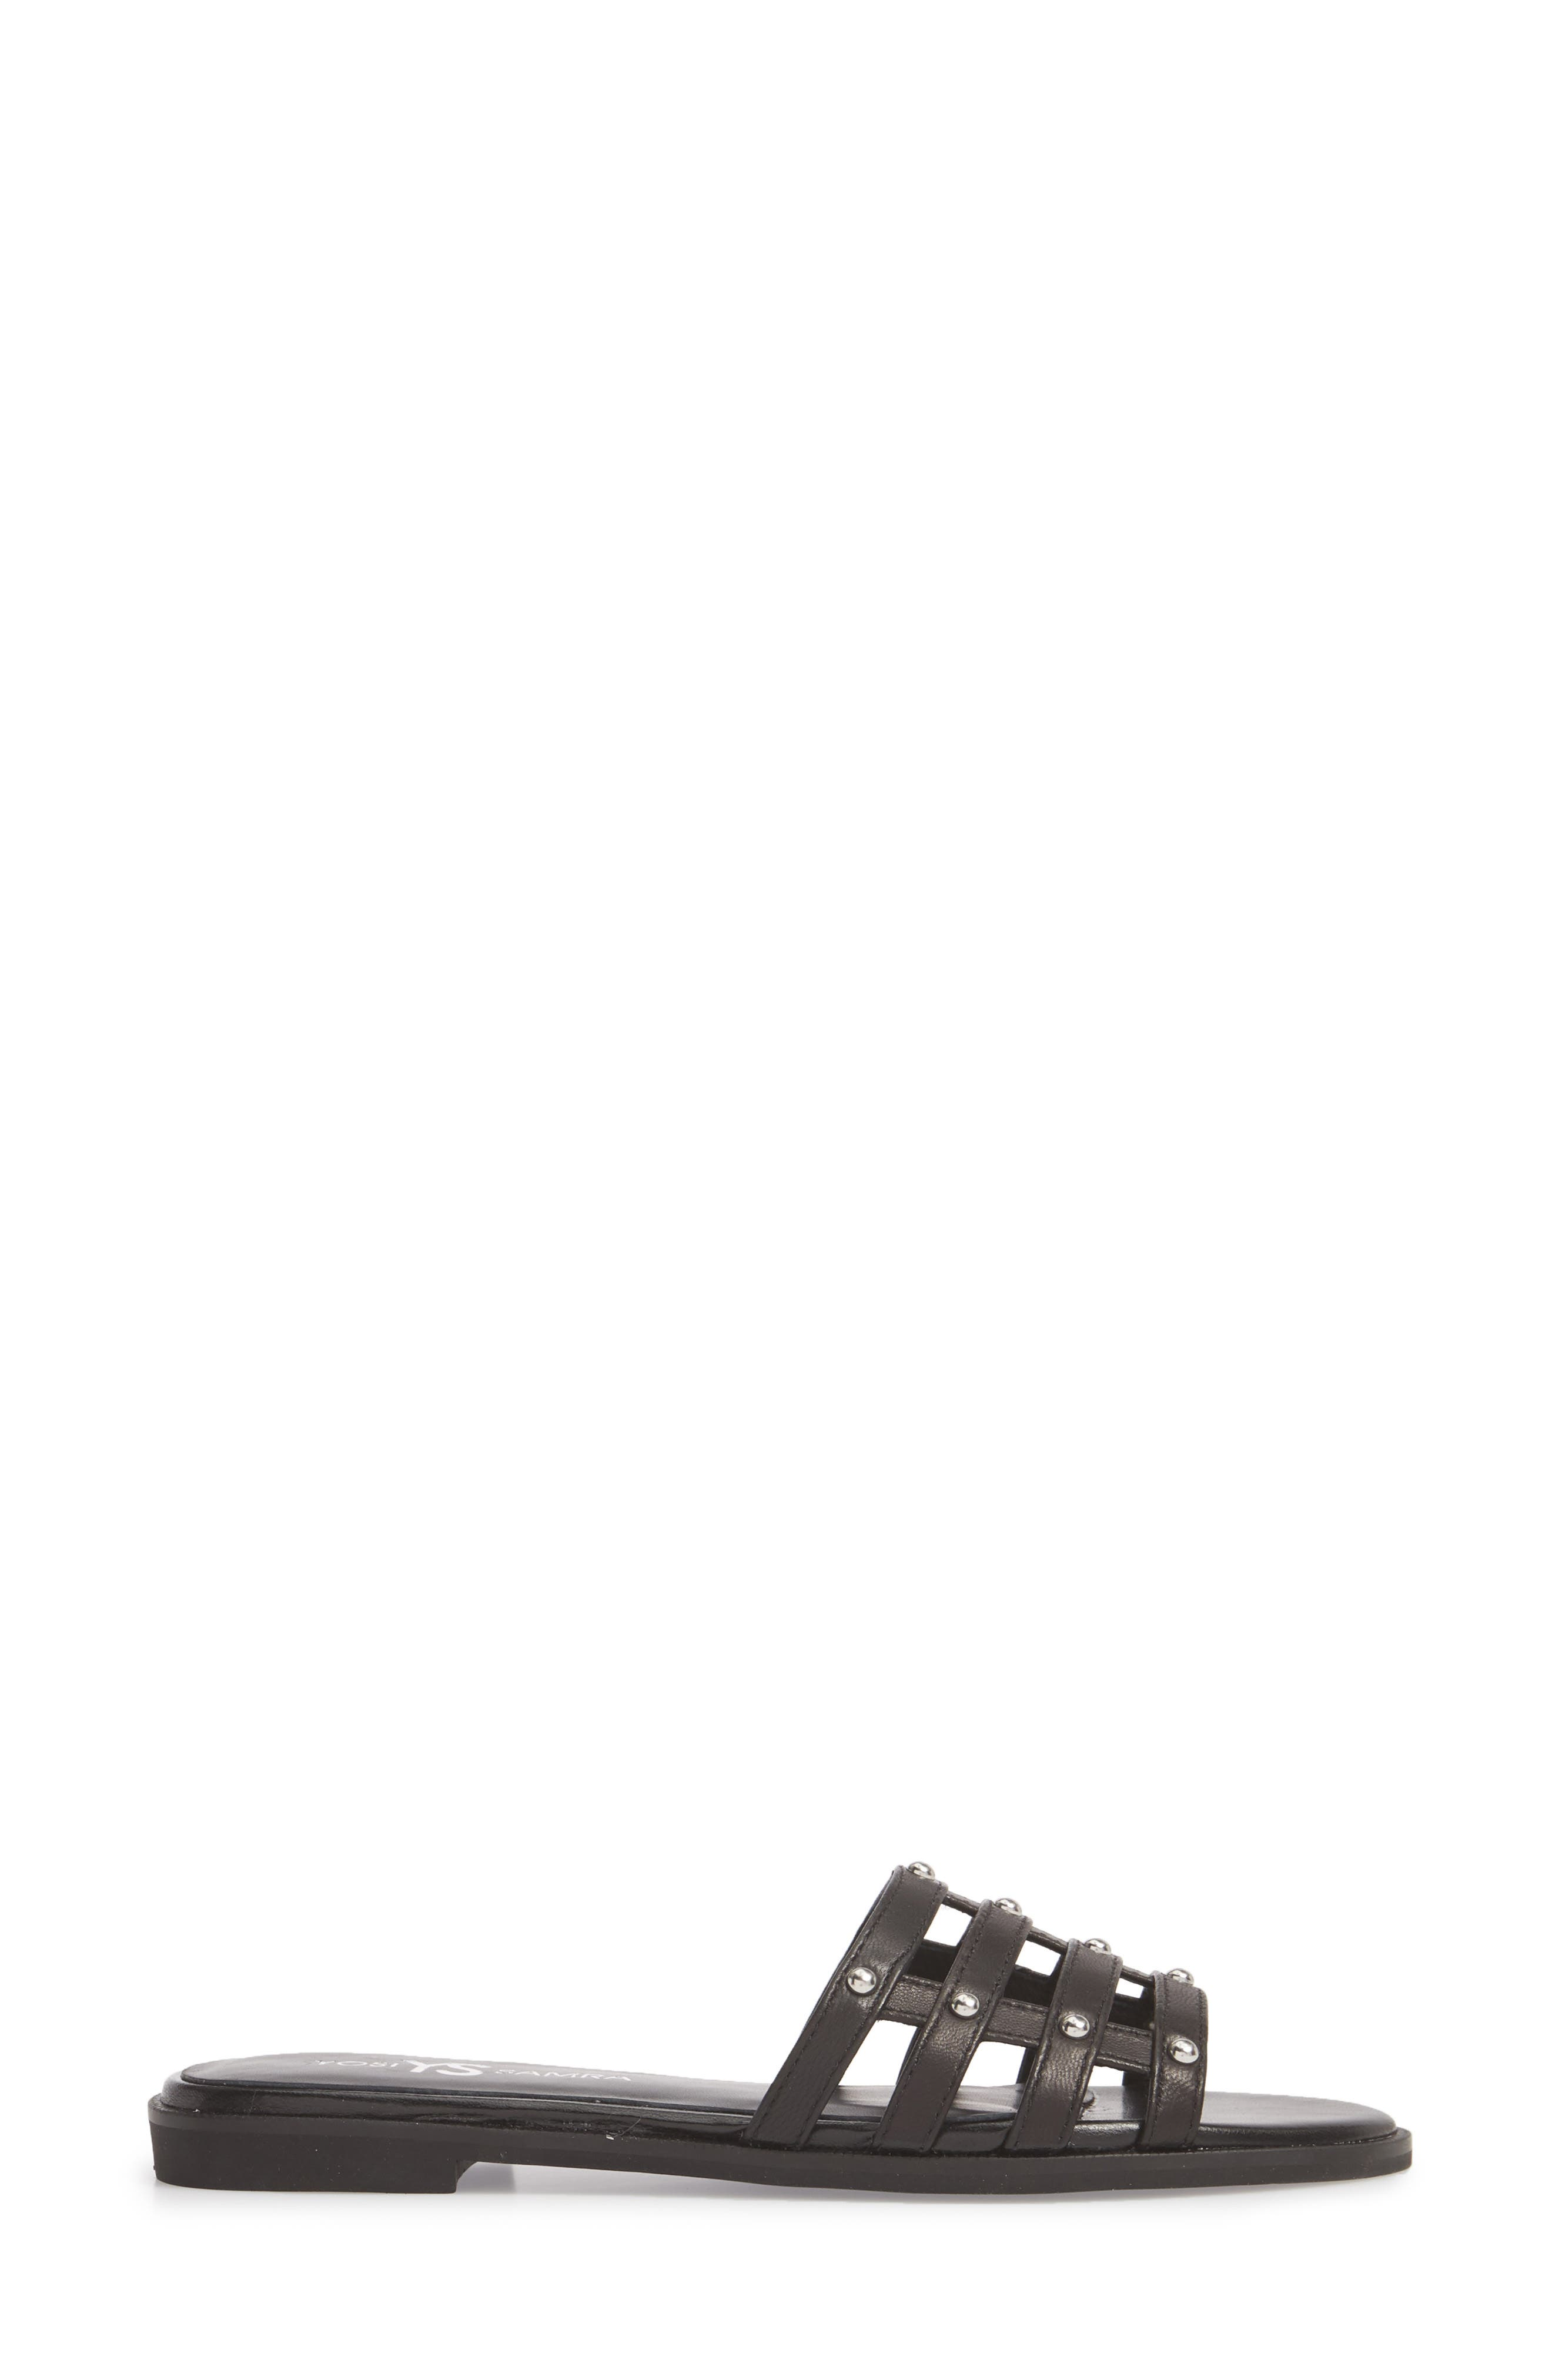 Cara Slide Sandal,                             Alternate thumbnail 3, color,                             Black/ Silver Studs